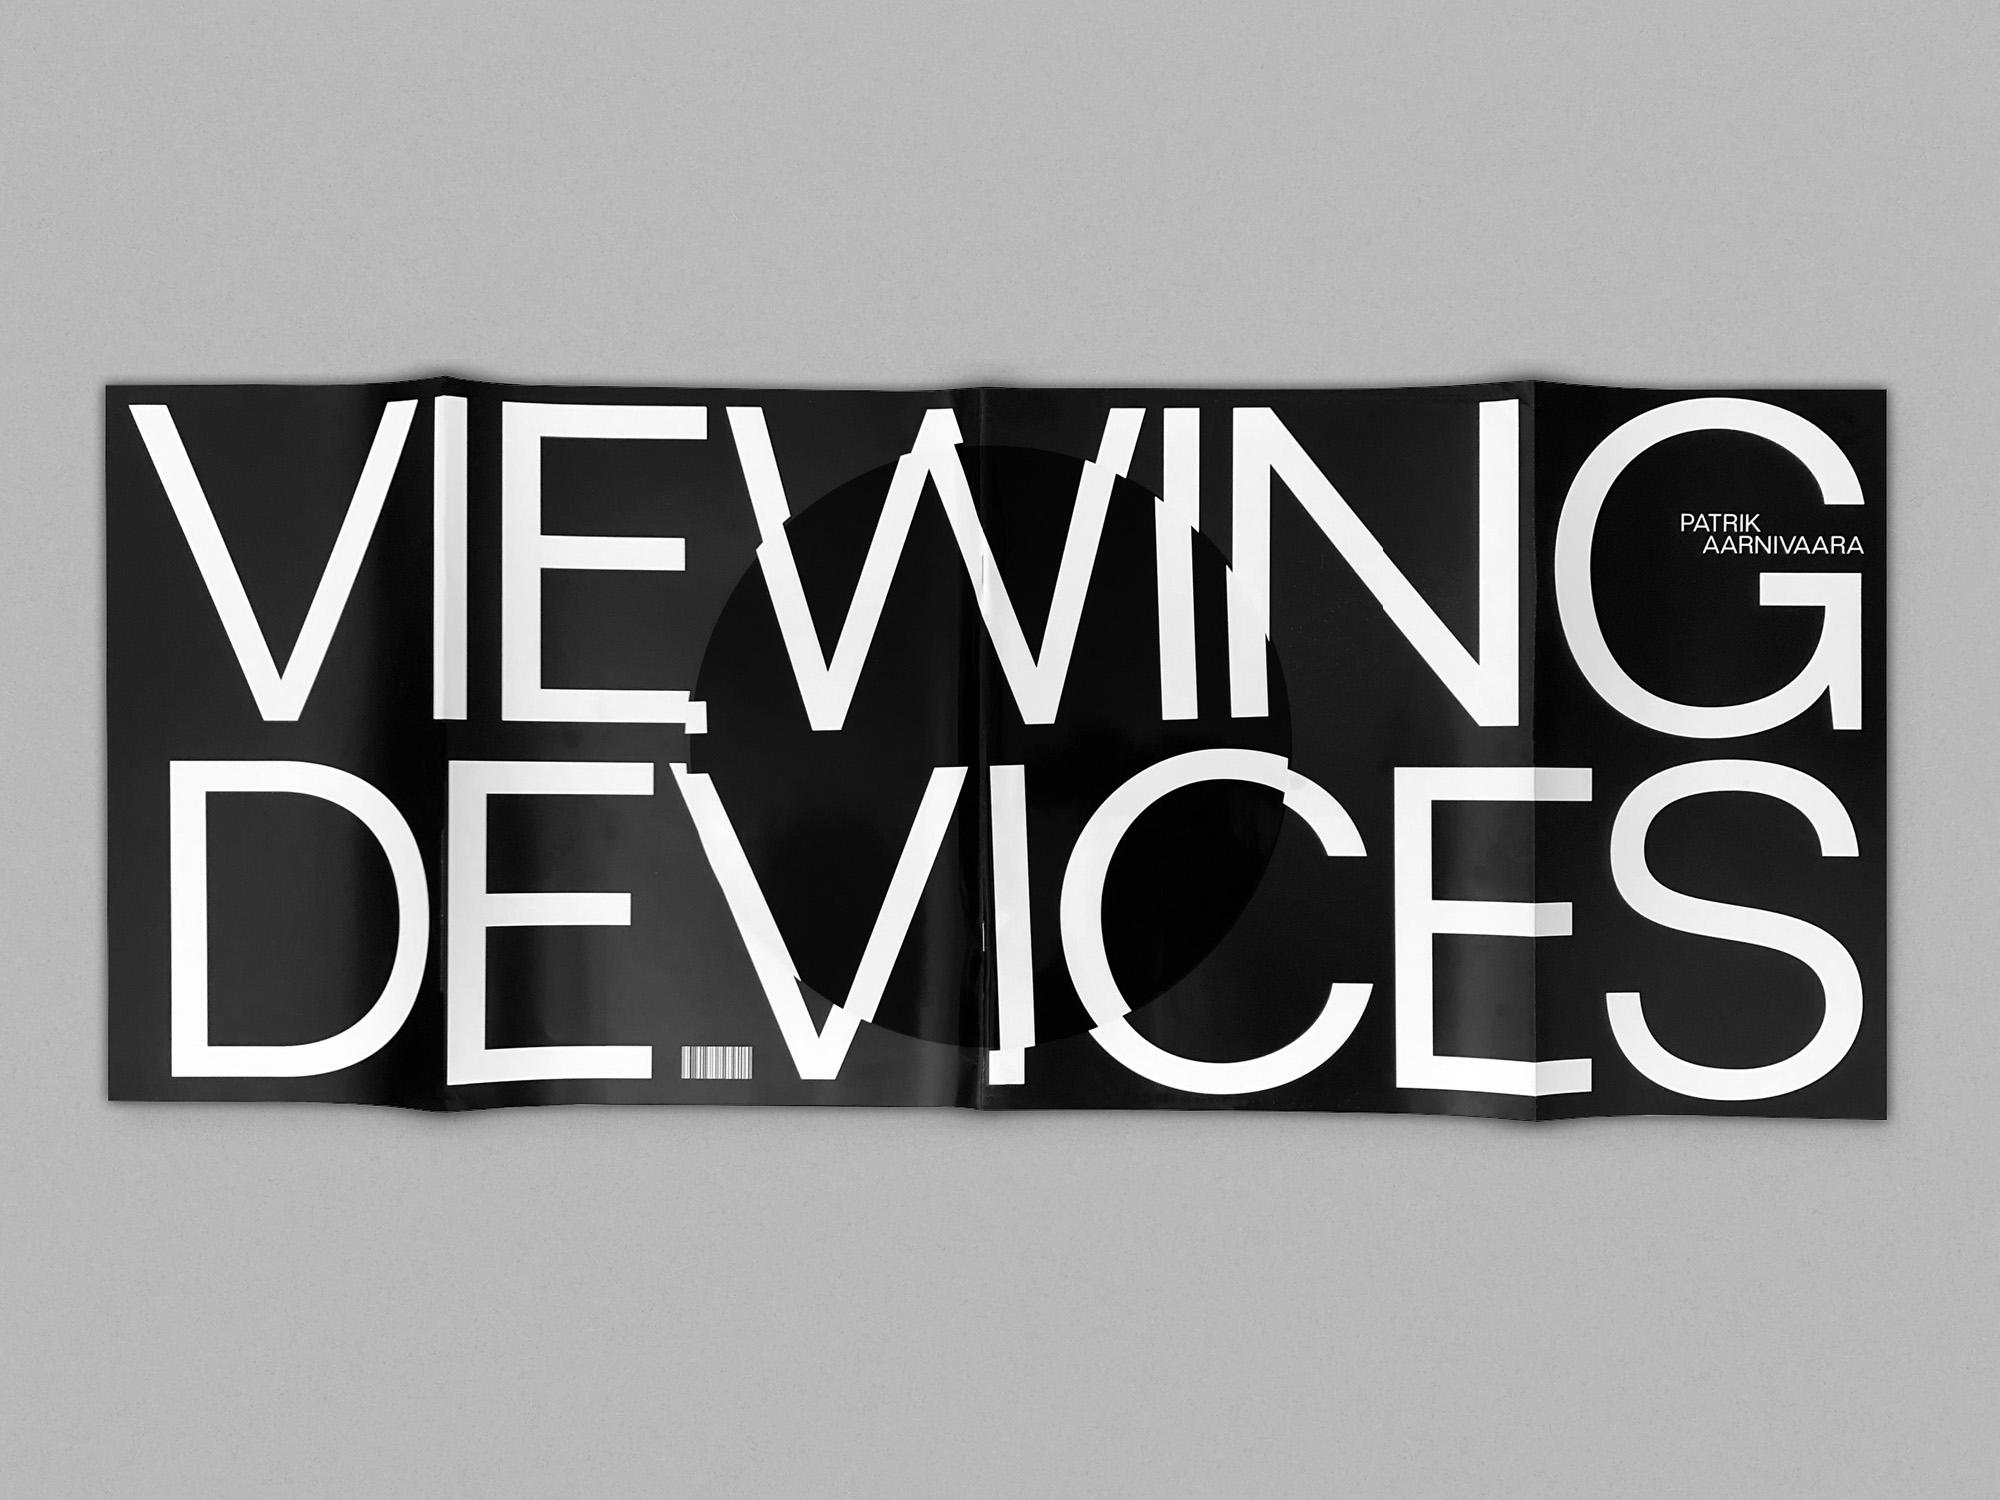 Patrik Aarnivaara Viewing Devices publication cover design